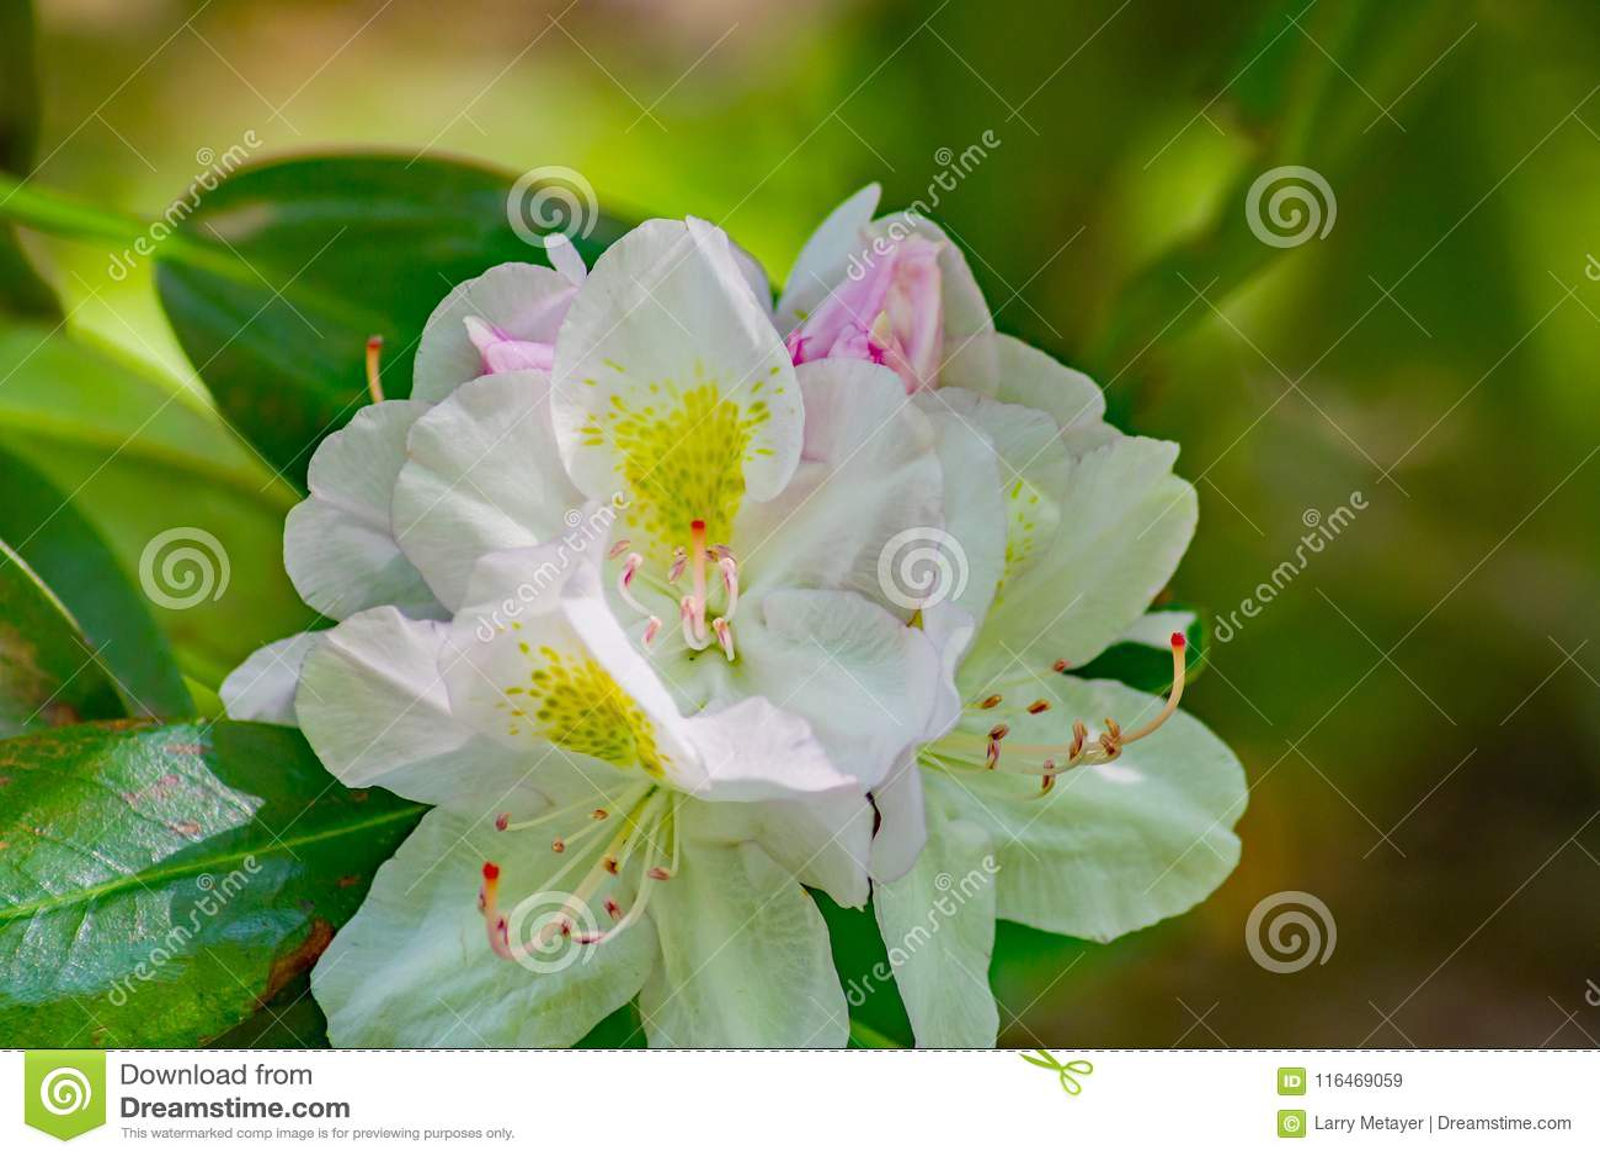 Großer Lorbeer - Rhododendronmaximum